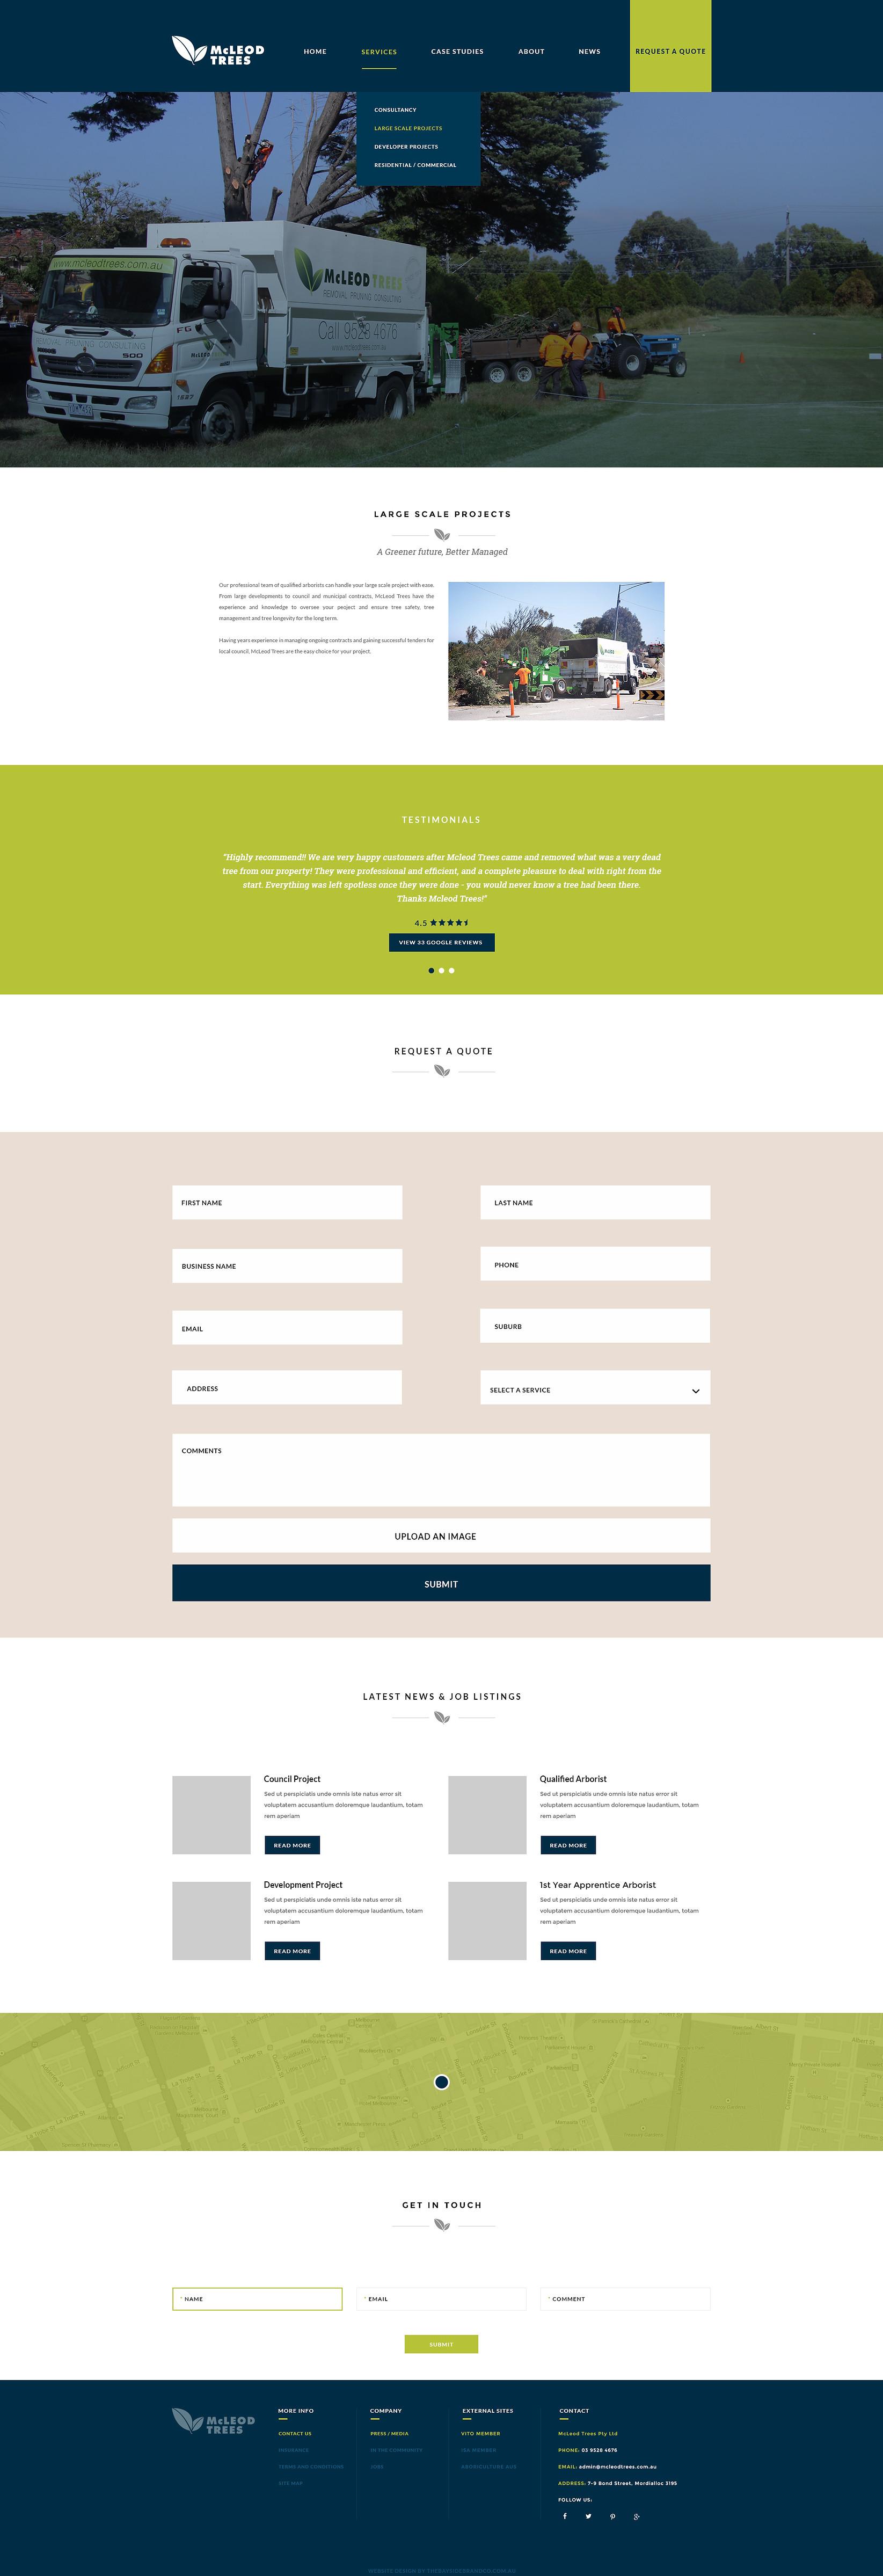 McLeod Trees_Website Mockup_Large Scale